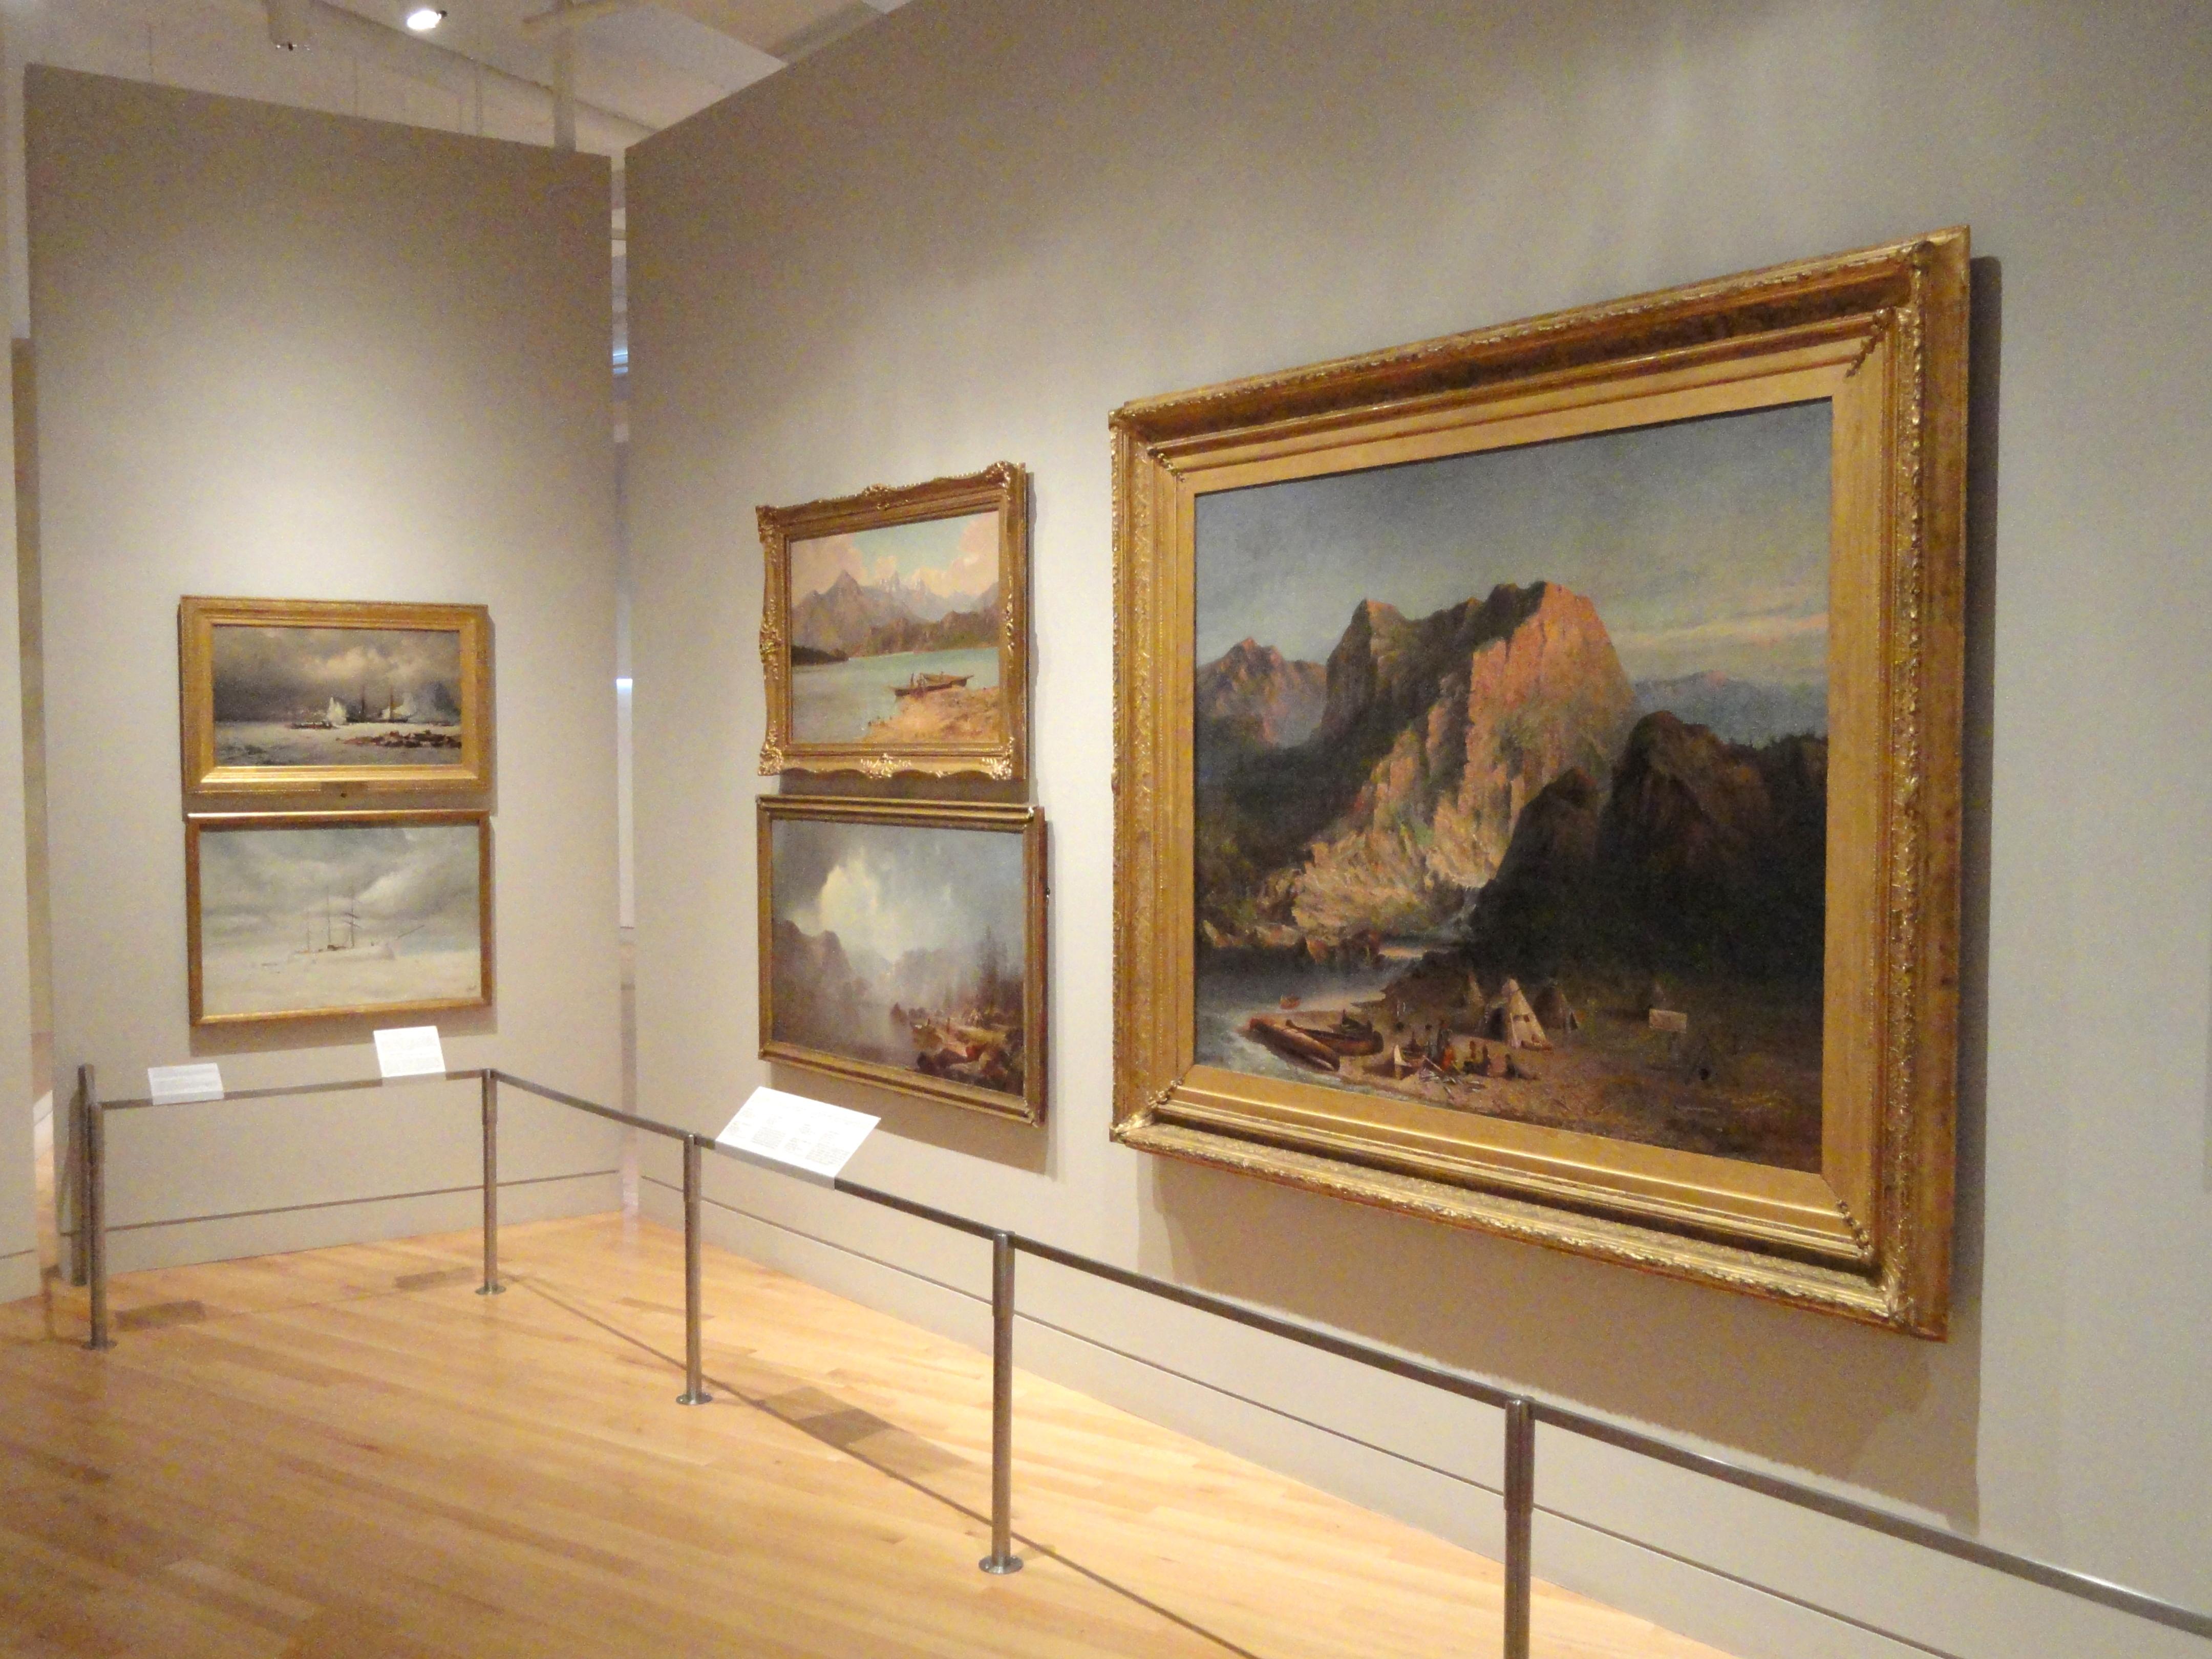 File:Interior View, Canadian Paintings   Royal Ontario Museum   DSC00241.JPG